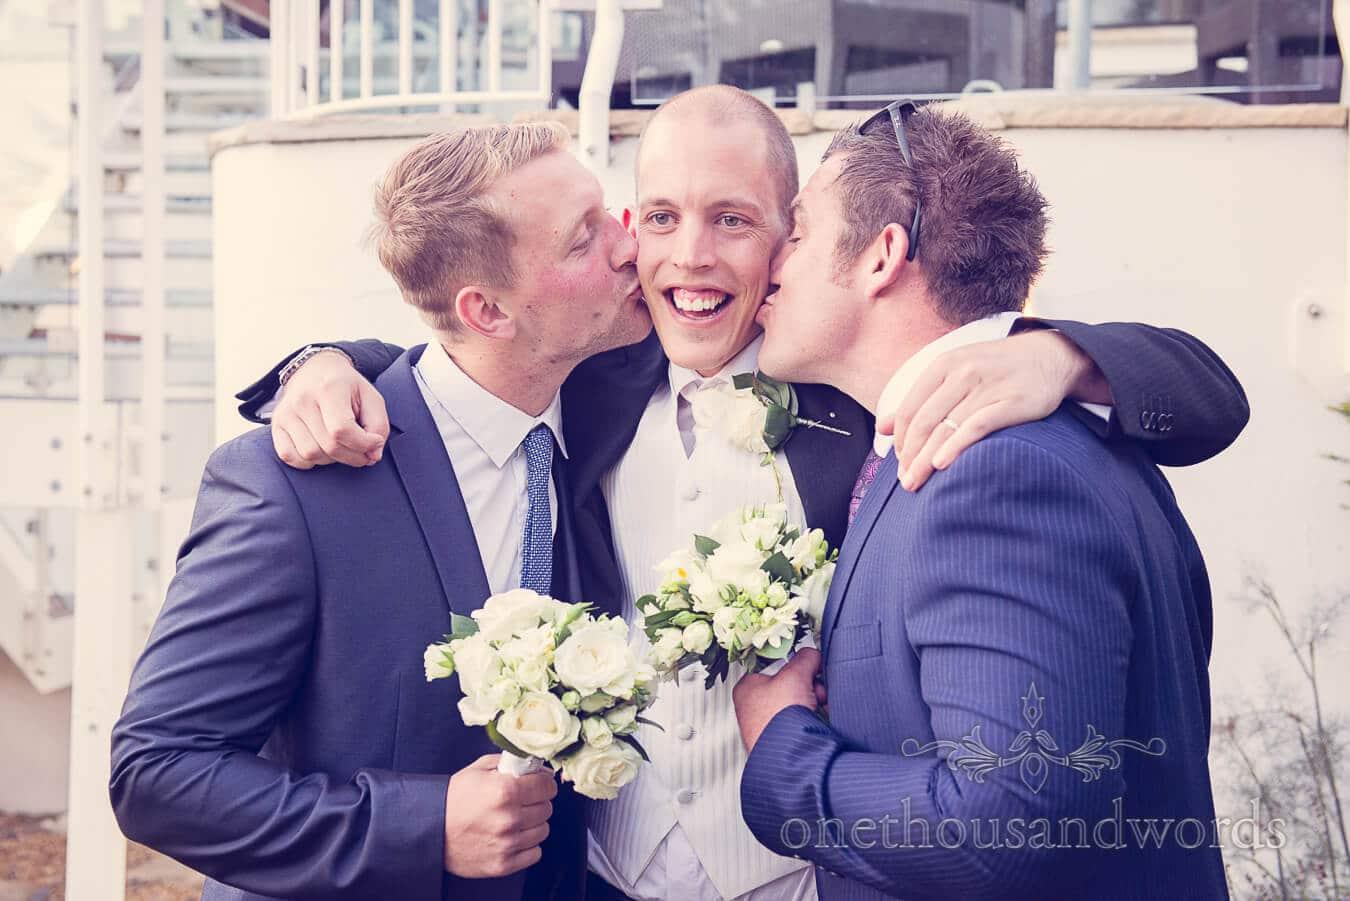 Groomsmen kiss the groom at Harbour Heights, Poole wedding venue